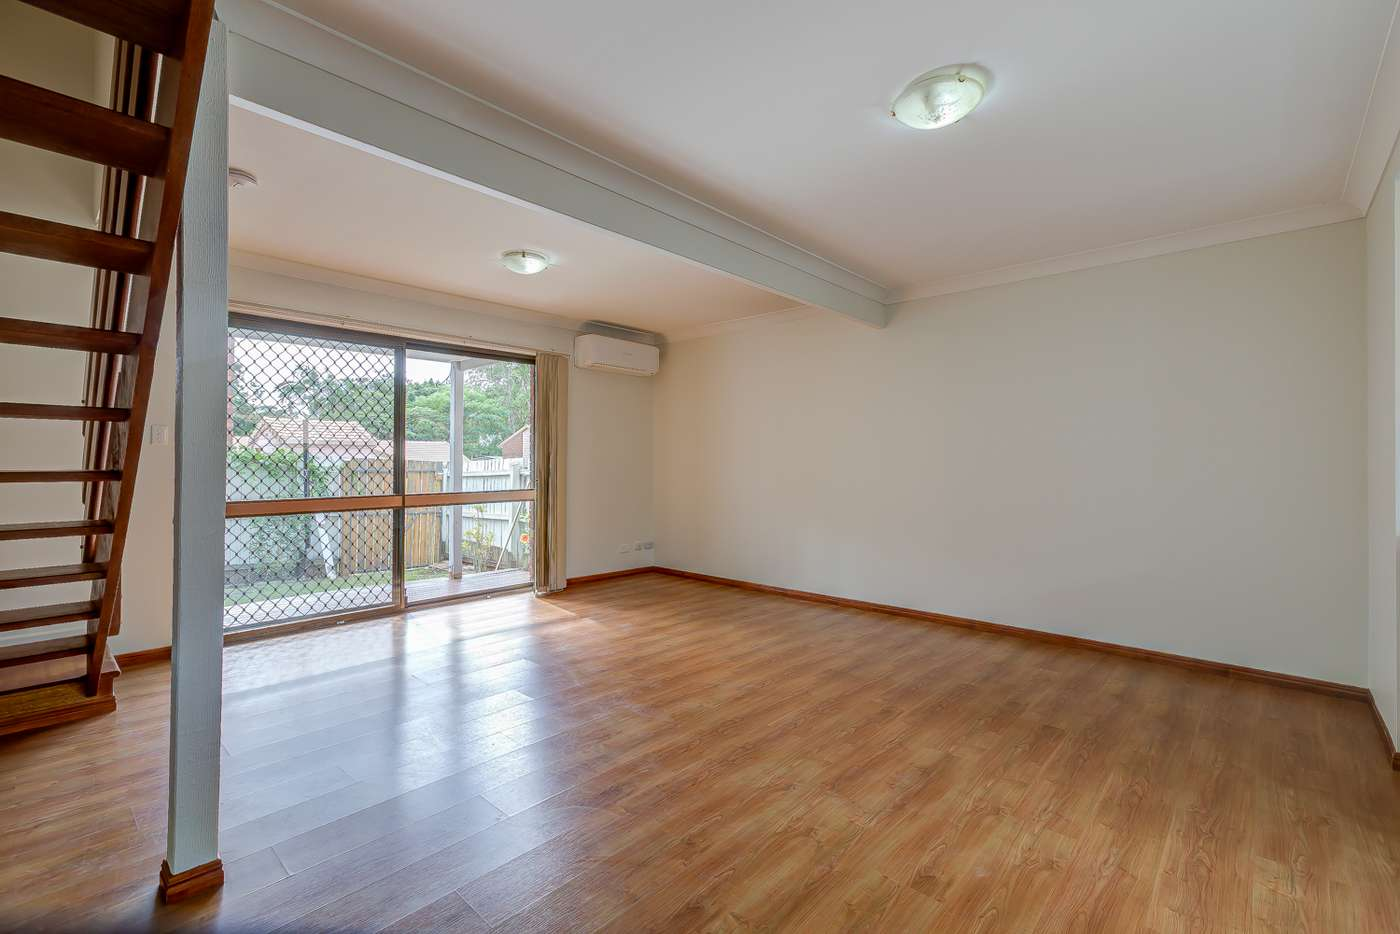 Sixth view of Homely house listing, 17/10 Damalis Street, Woodridge QLD 4114